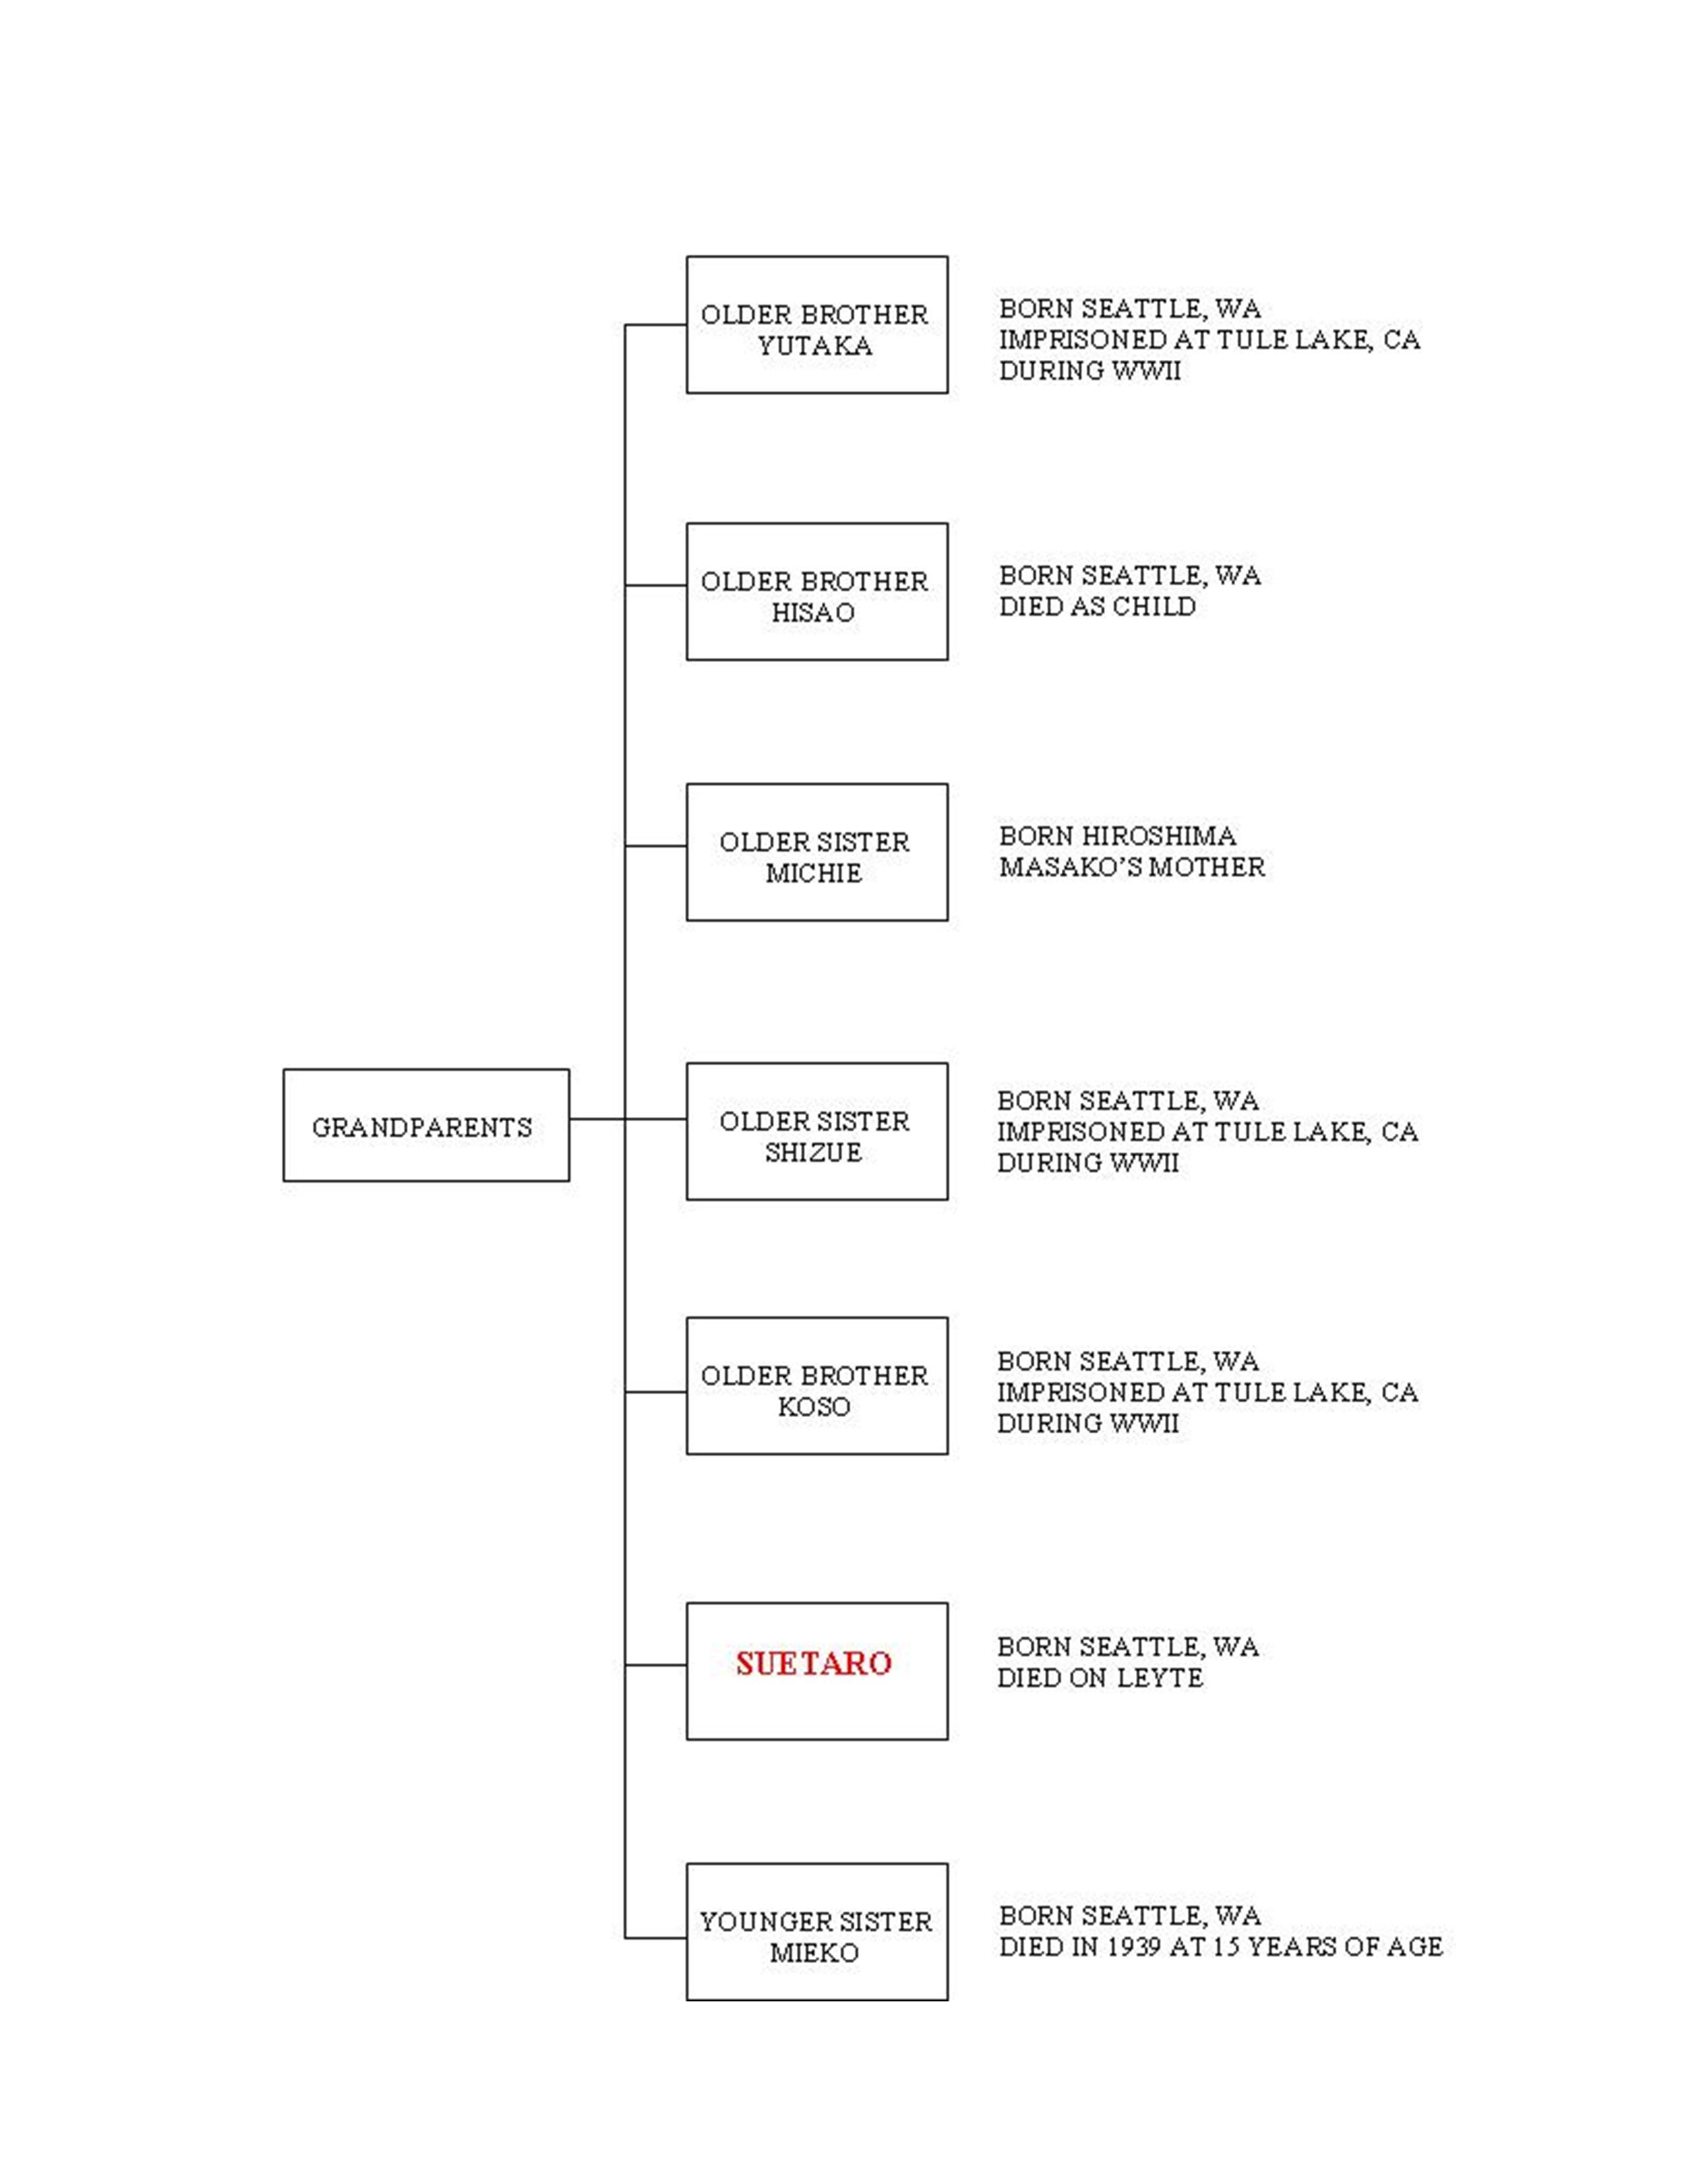 FAMILY ORG CHART WORDPRESS